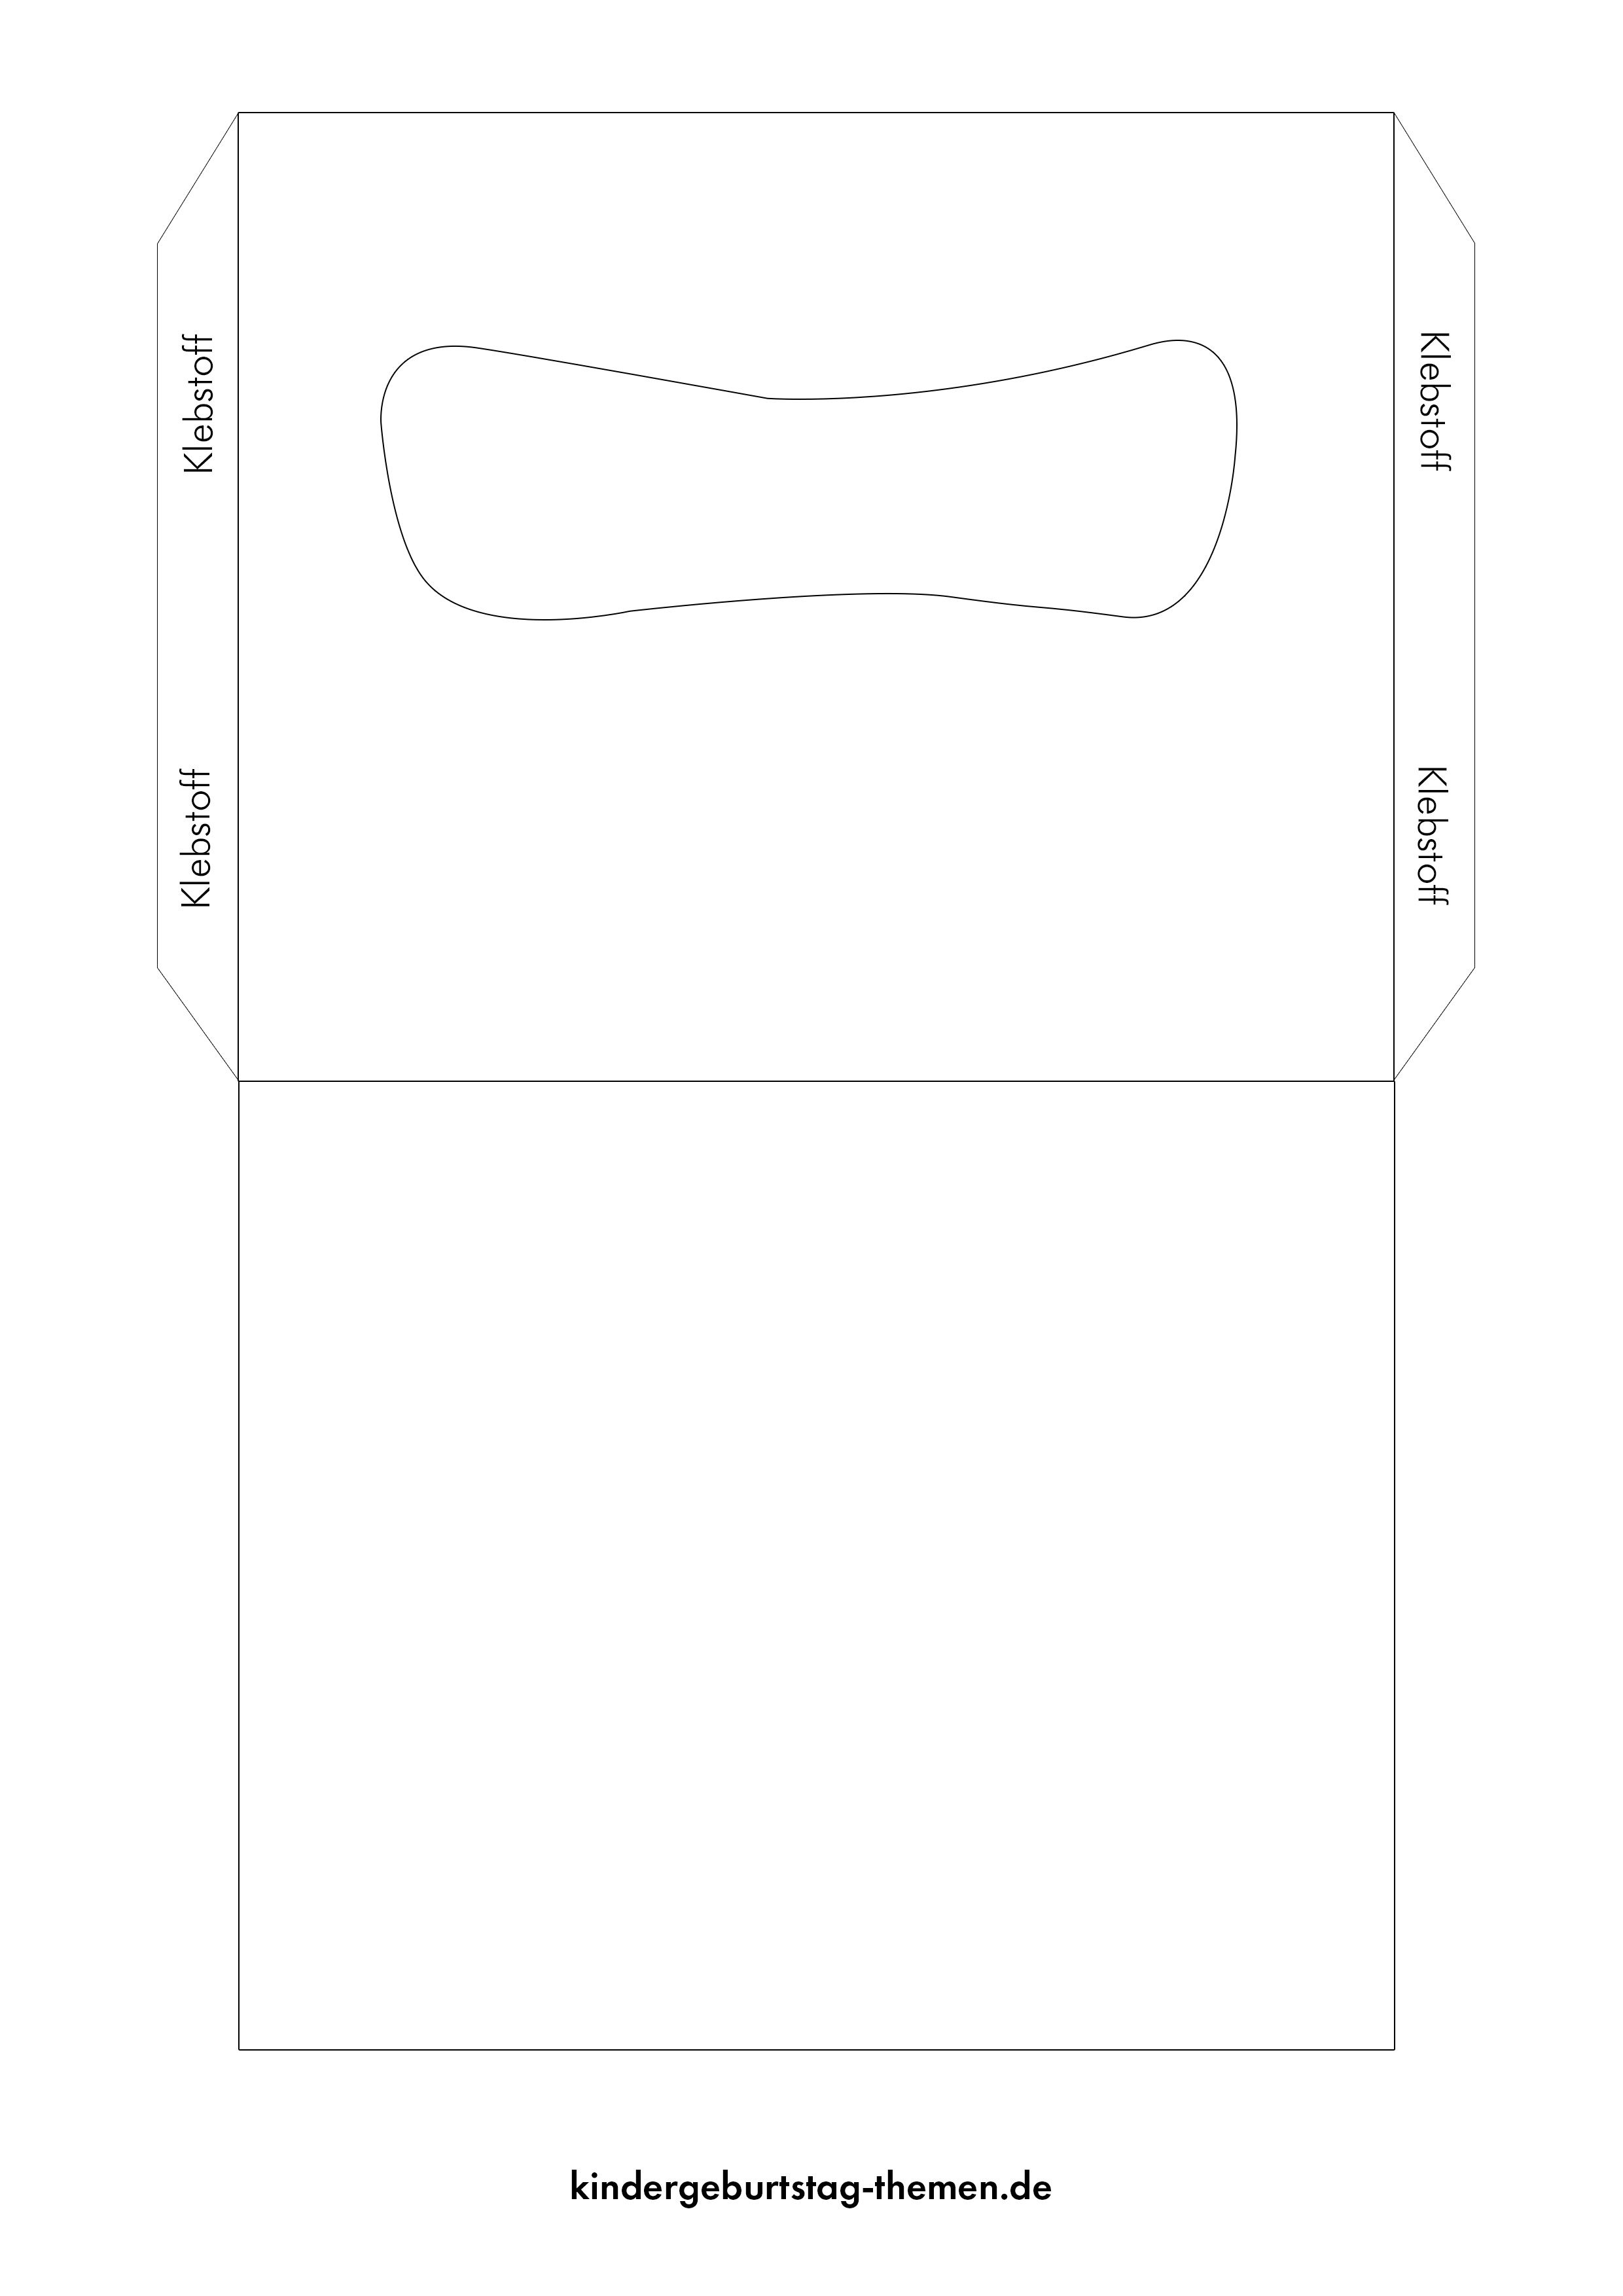 Photo of Ninjago invitation cards to print out